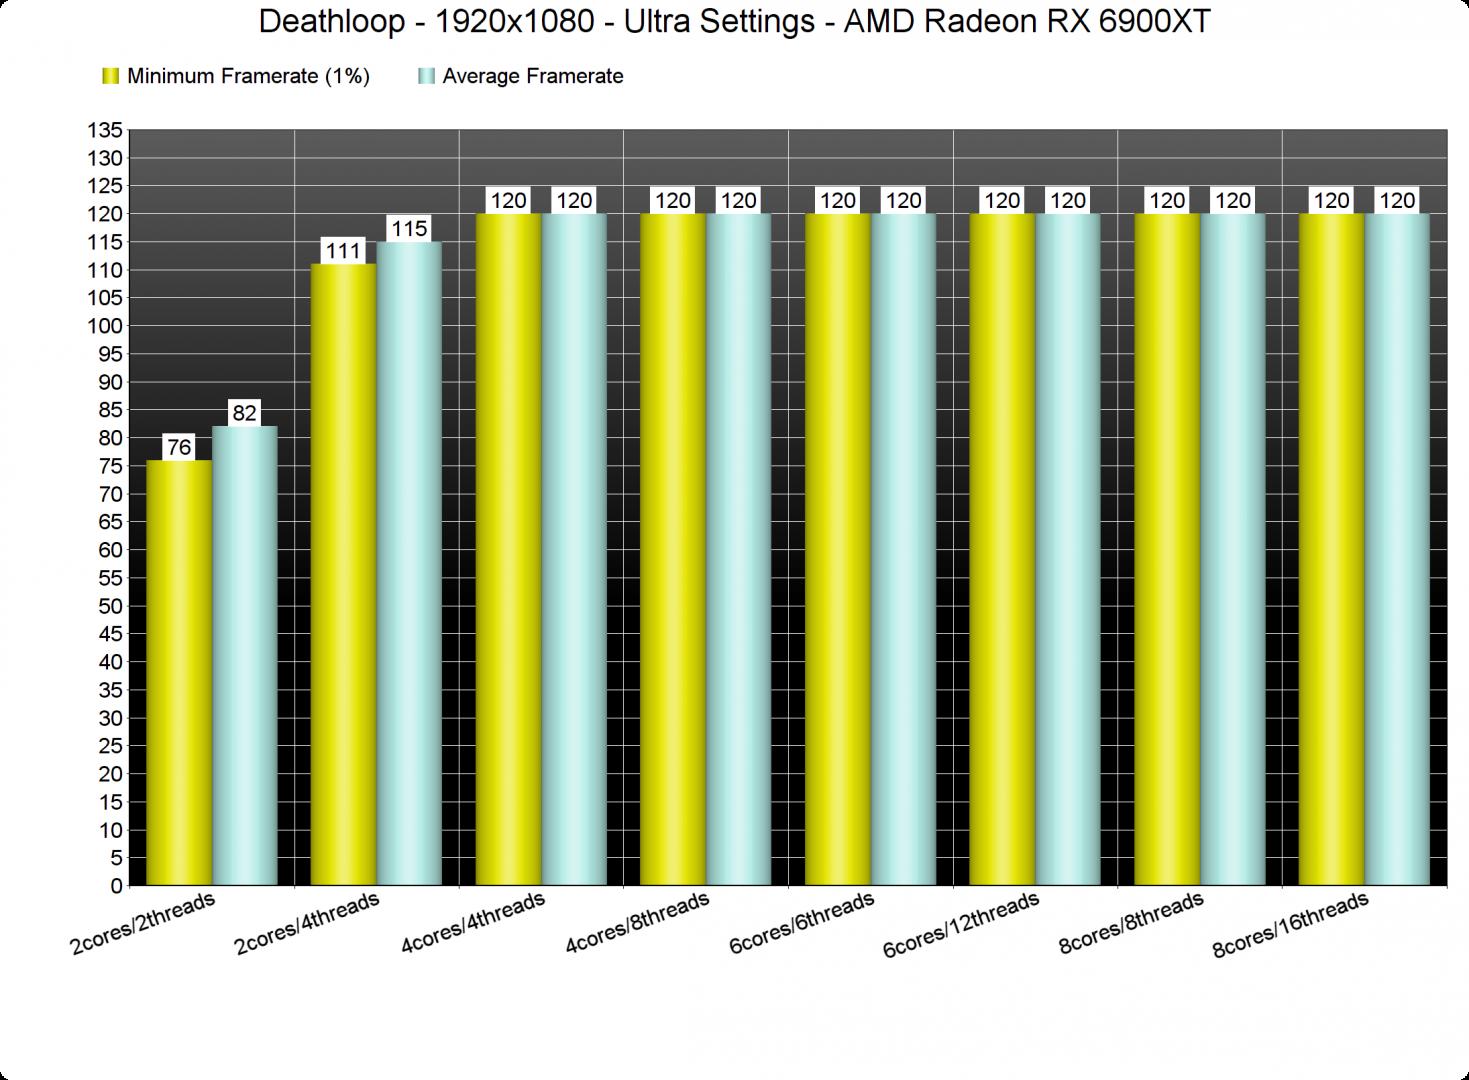 Deathloop CPU benchmarks